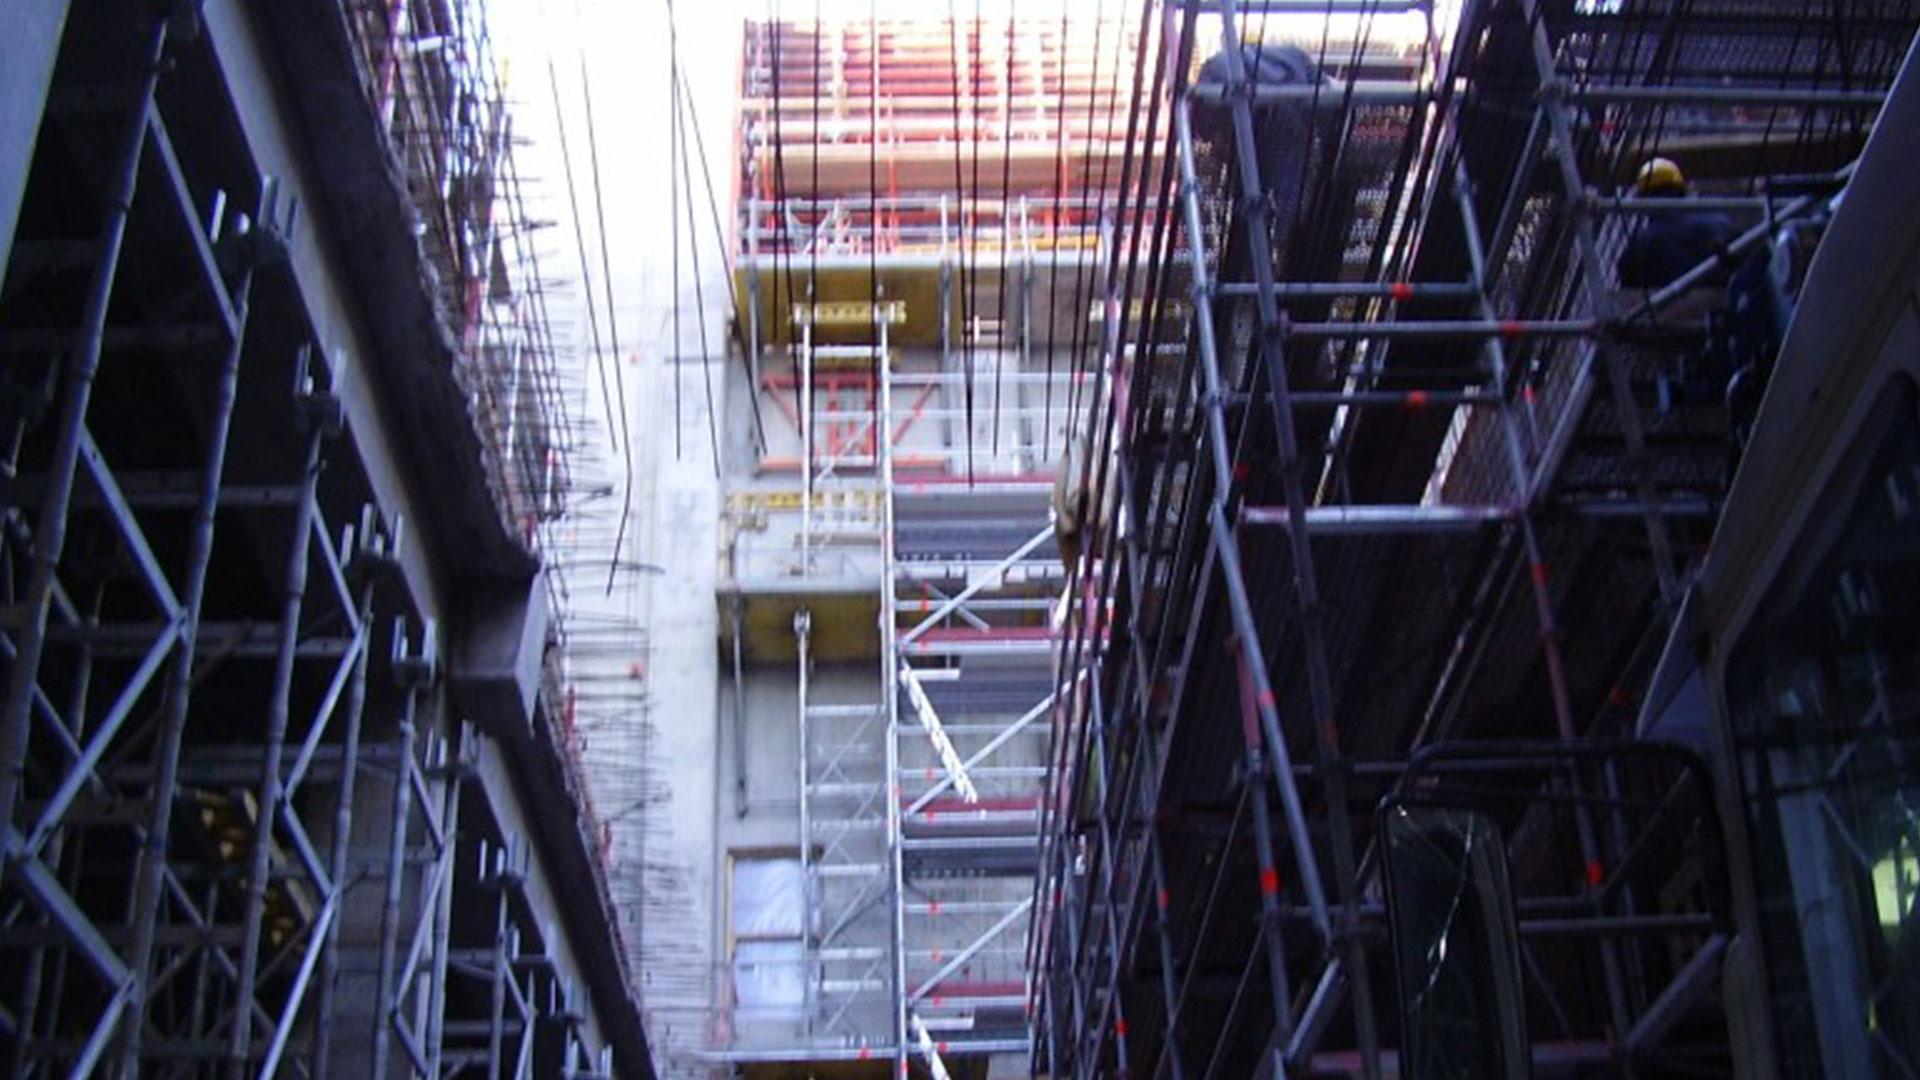 Prace żelbetowe elektrownia Szwecja – Reinforce concrete works at elektrician plant Sweden